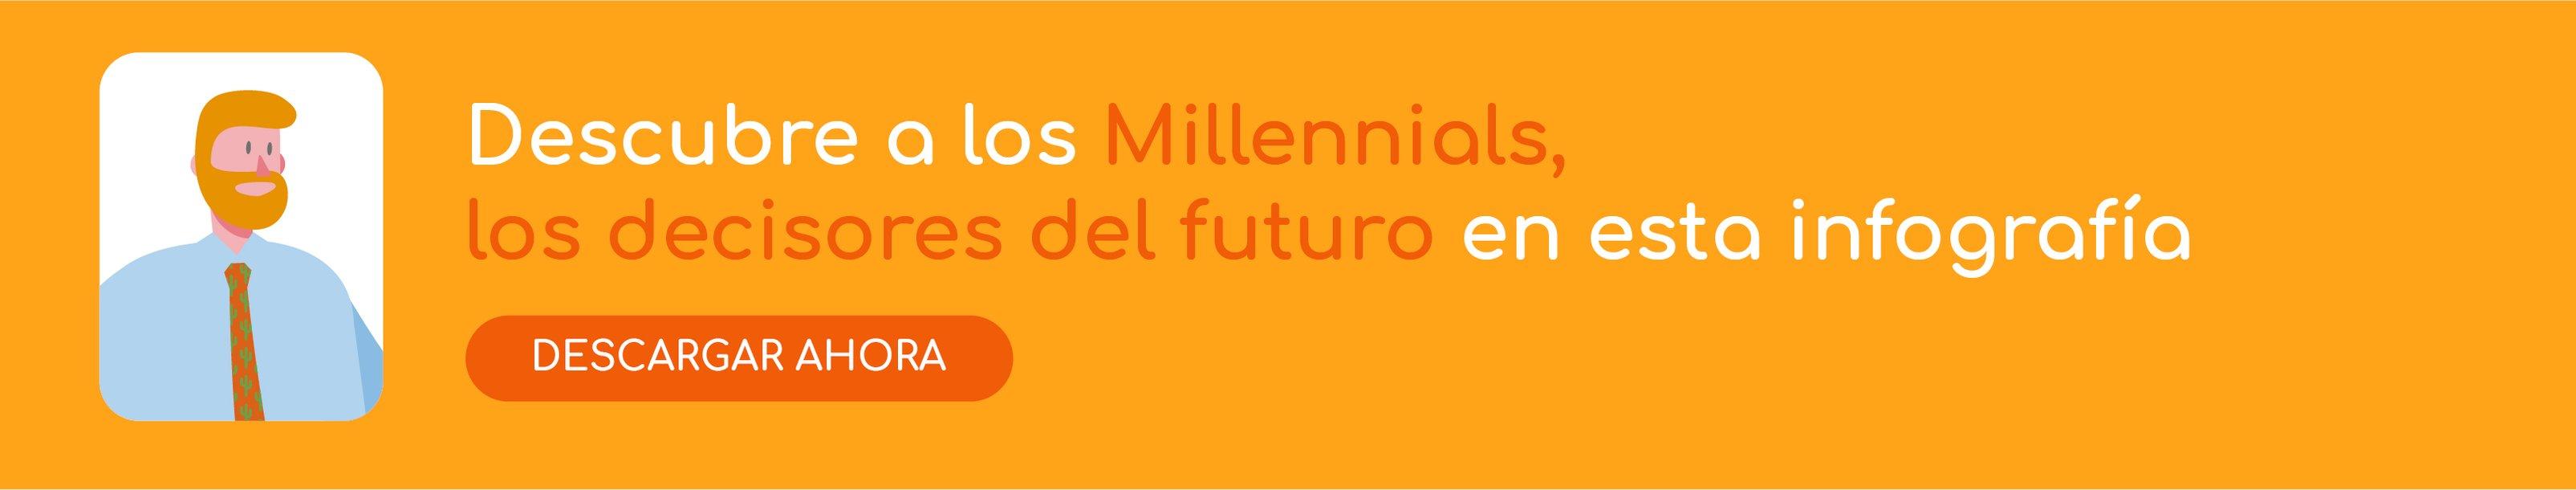 Infografía millennials decisores del futuro